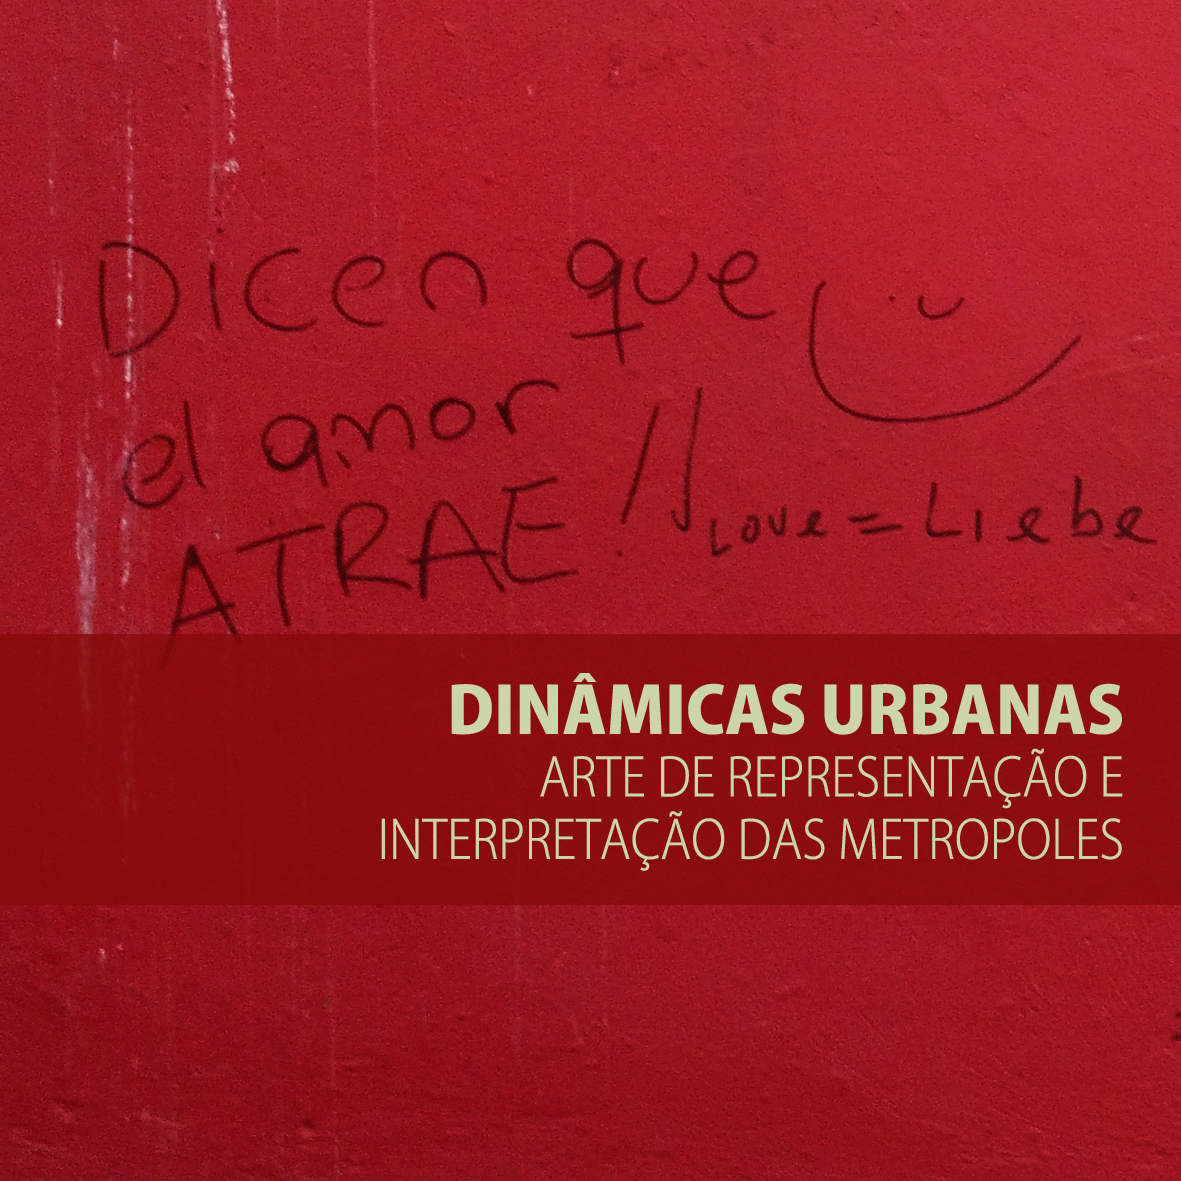 Paisagens Hibridas - dinamicas urbanas